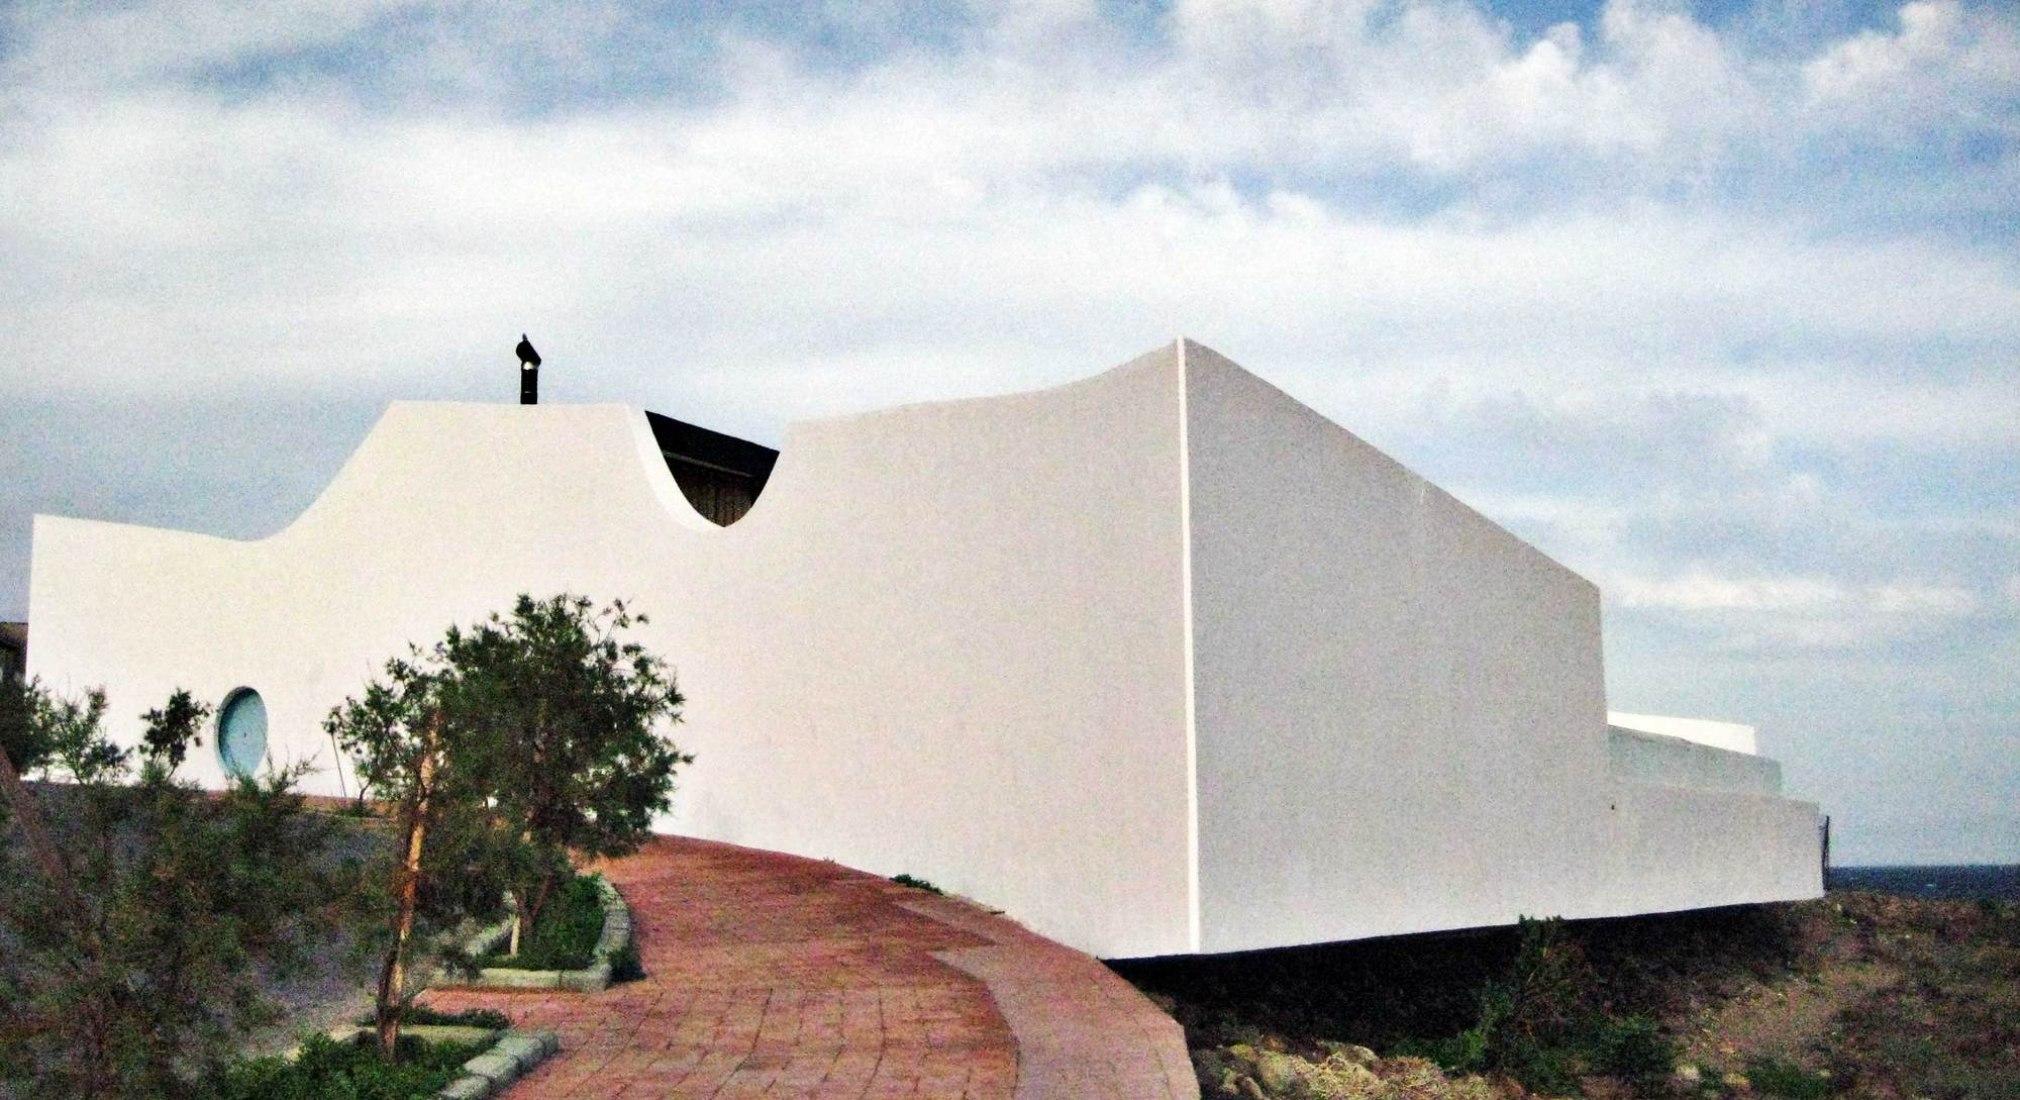 House of Herzog in Tenerife. Photograph © Donacio Cejas